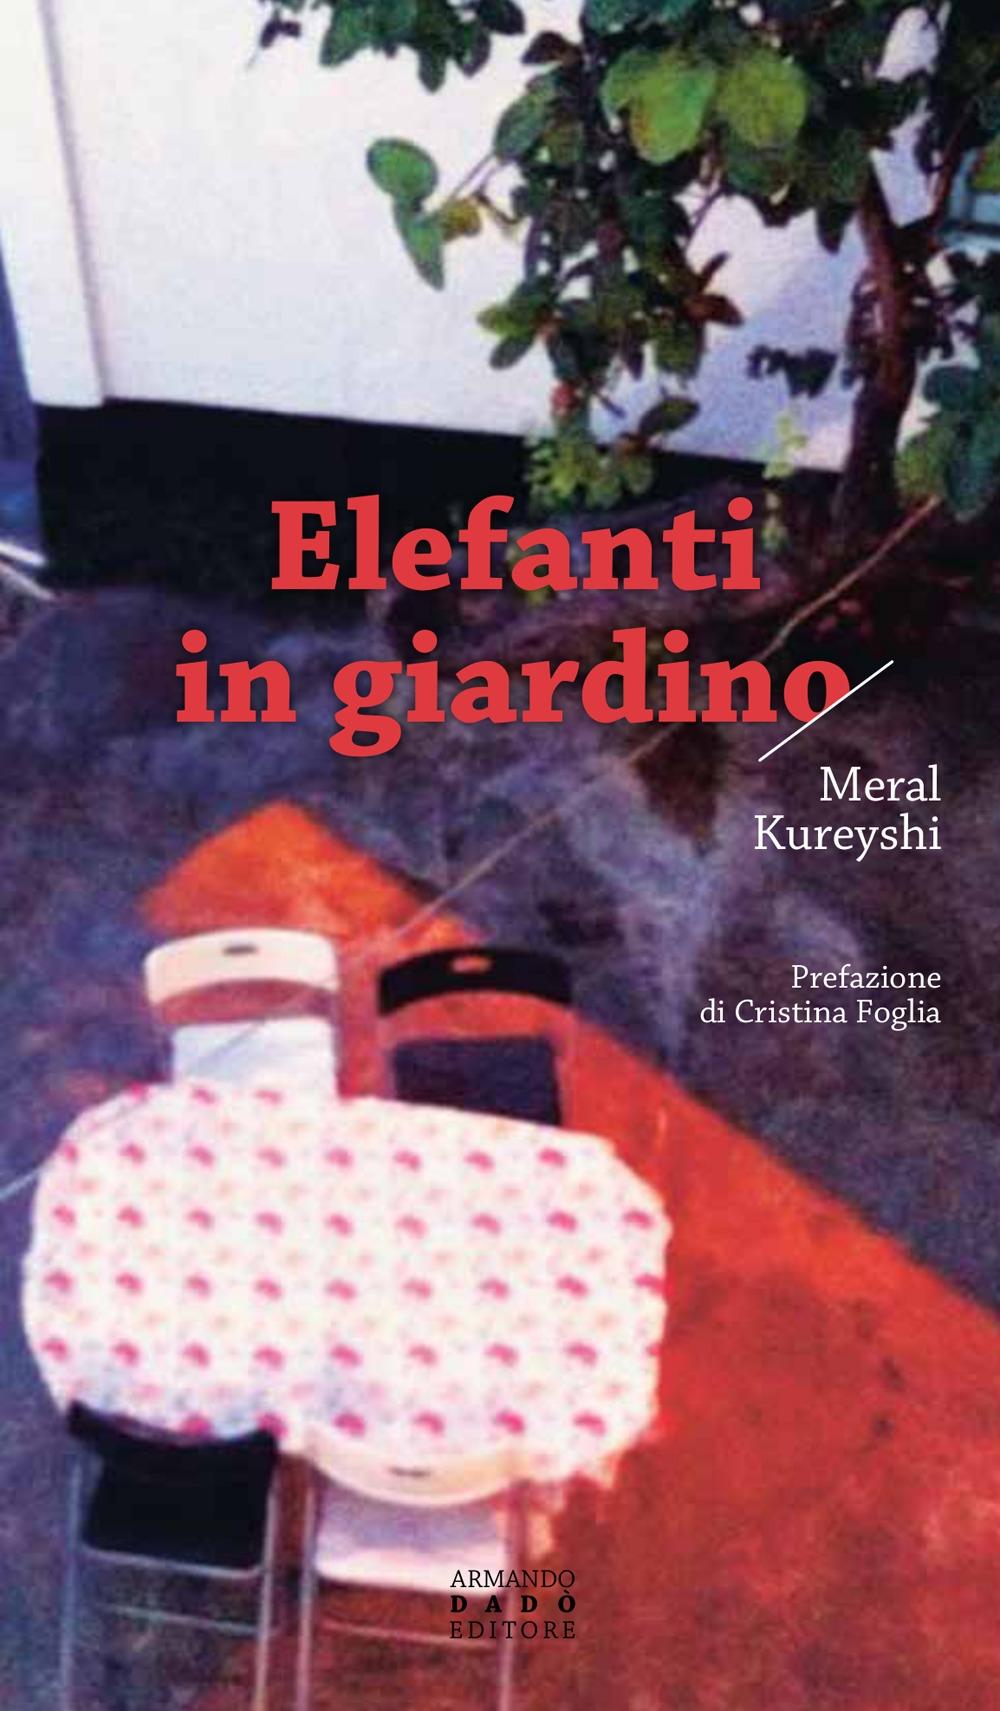 Tango per emigranti e vagabondi.